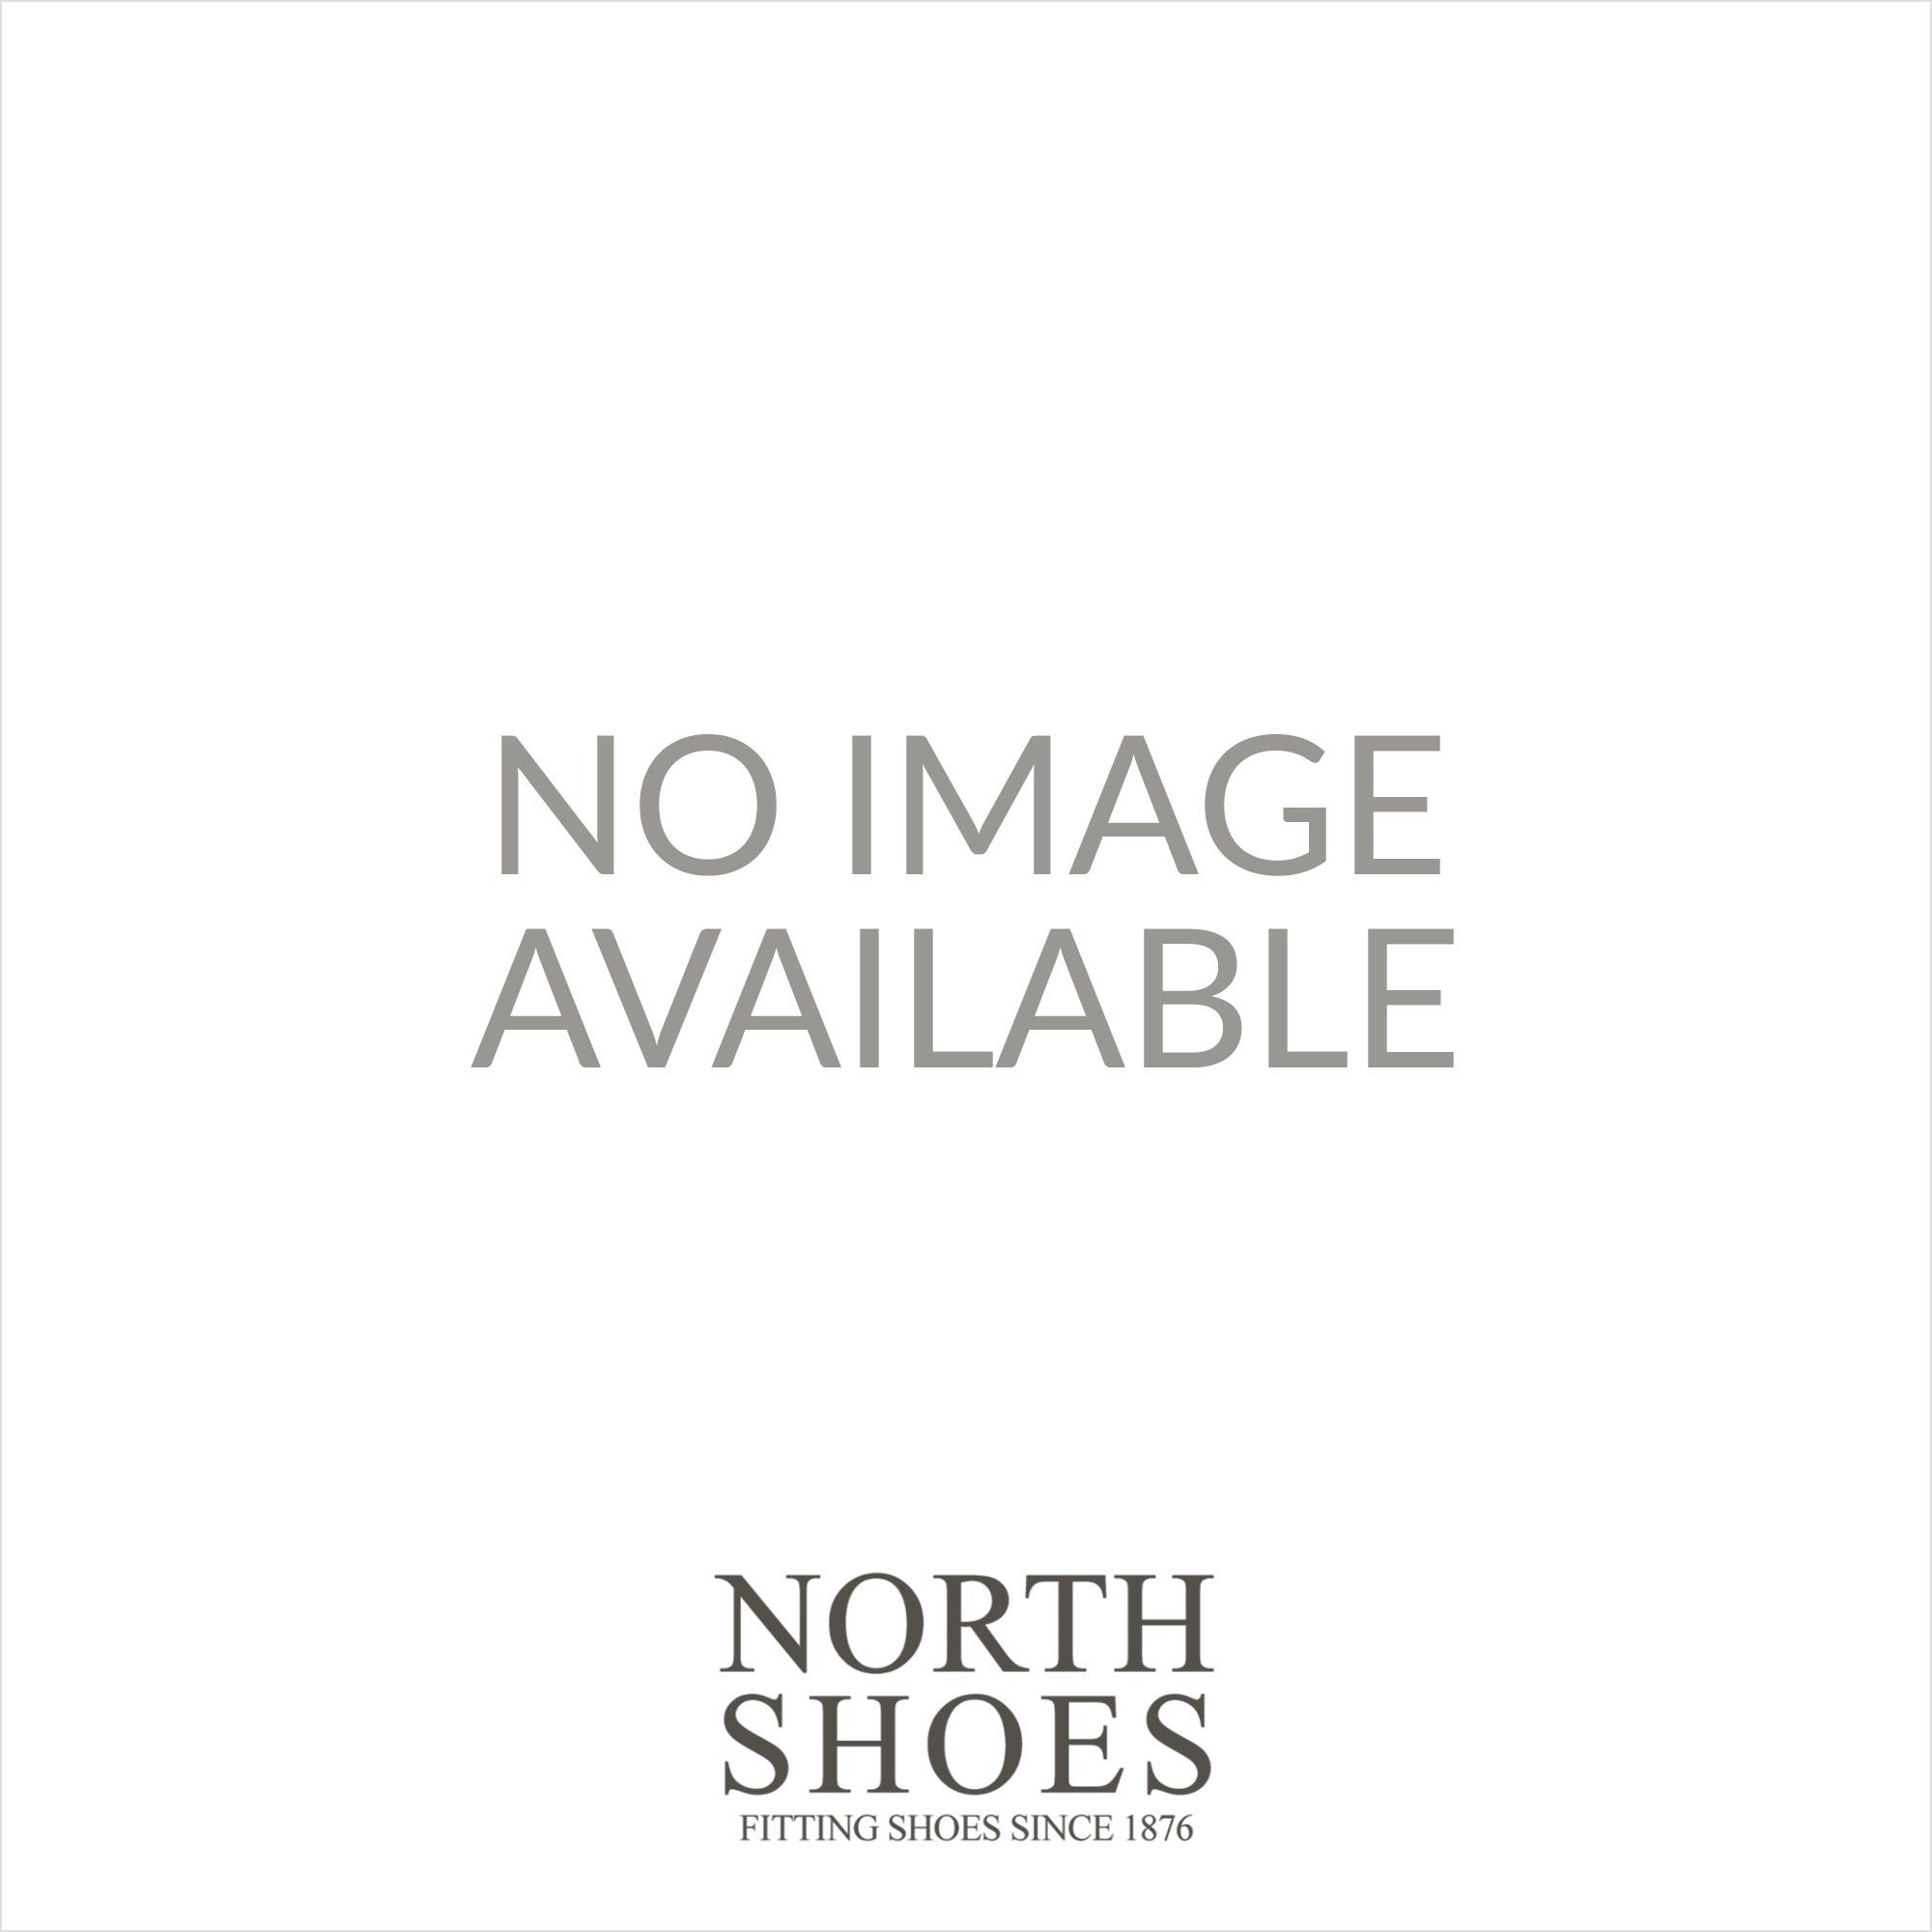 740a84c3f57 Clarks Petrina Bianca Nude Leather Womens Wedge Slingback Sandals - UK 4½